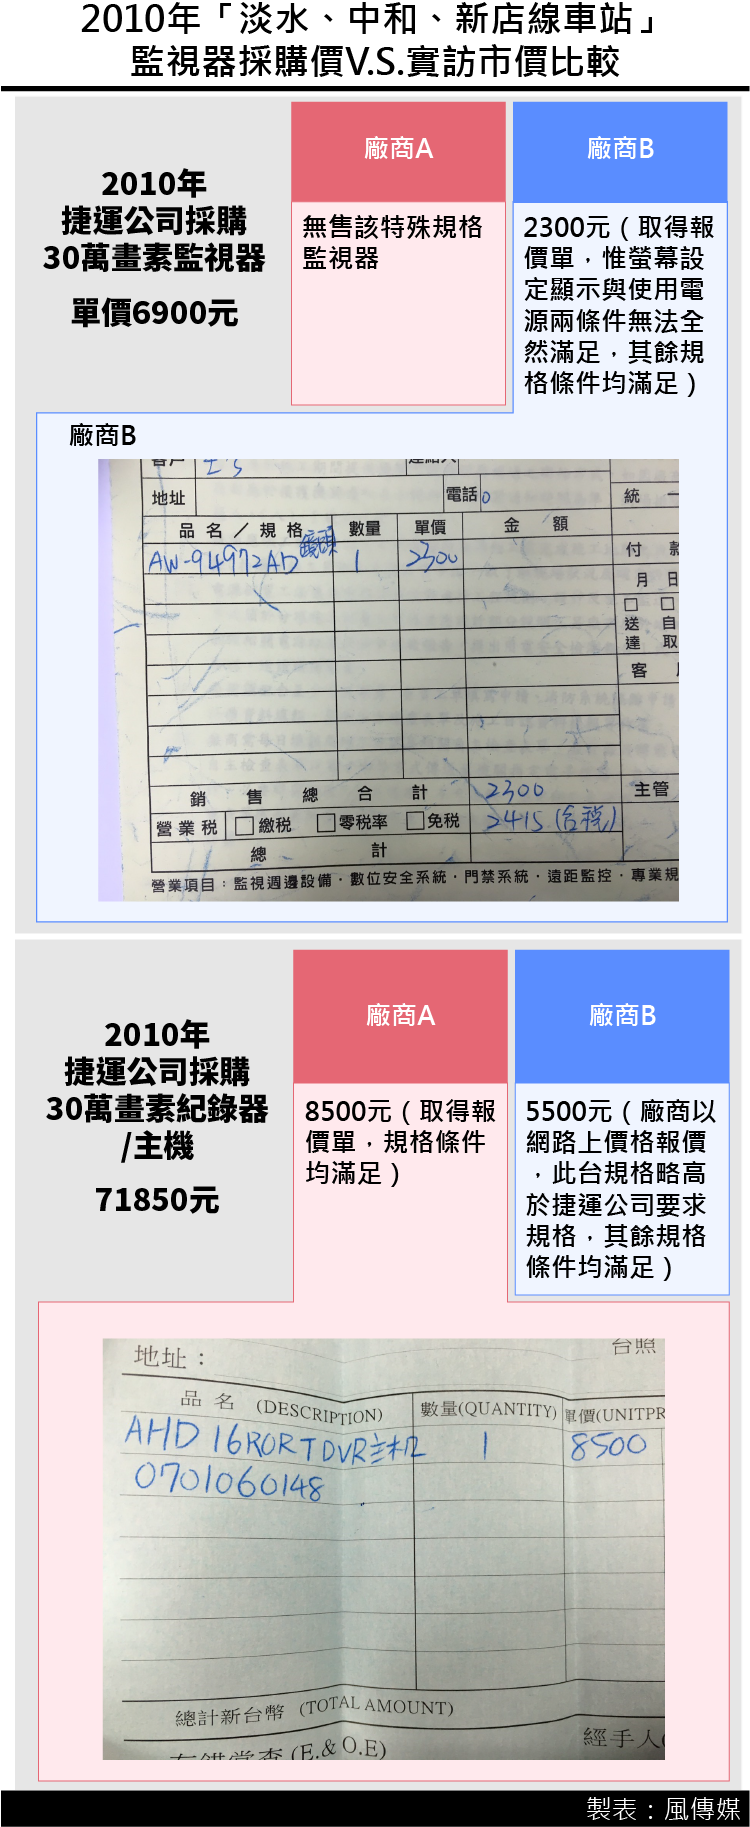 20161223-SMG0035-2016年「文湖線文山段」監視器採購價V.S.實訪市價比較-01.png